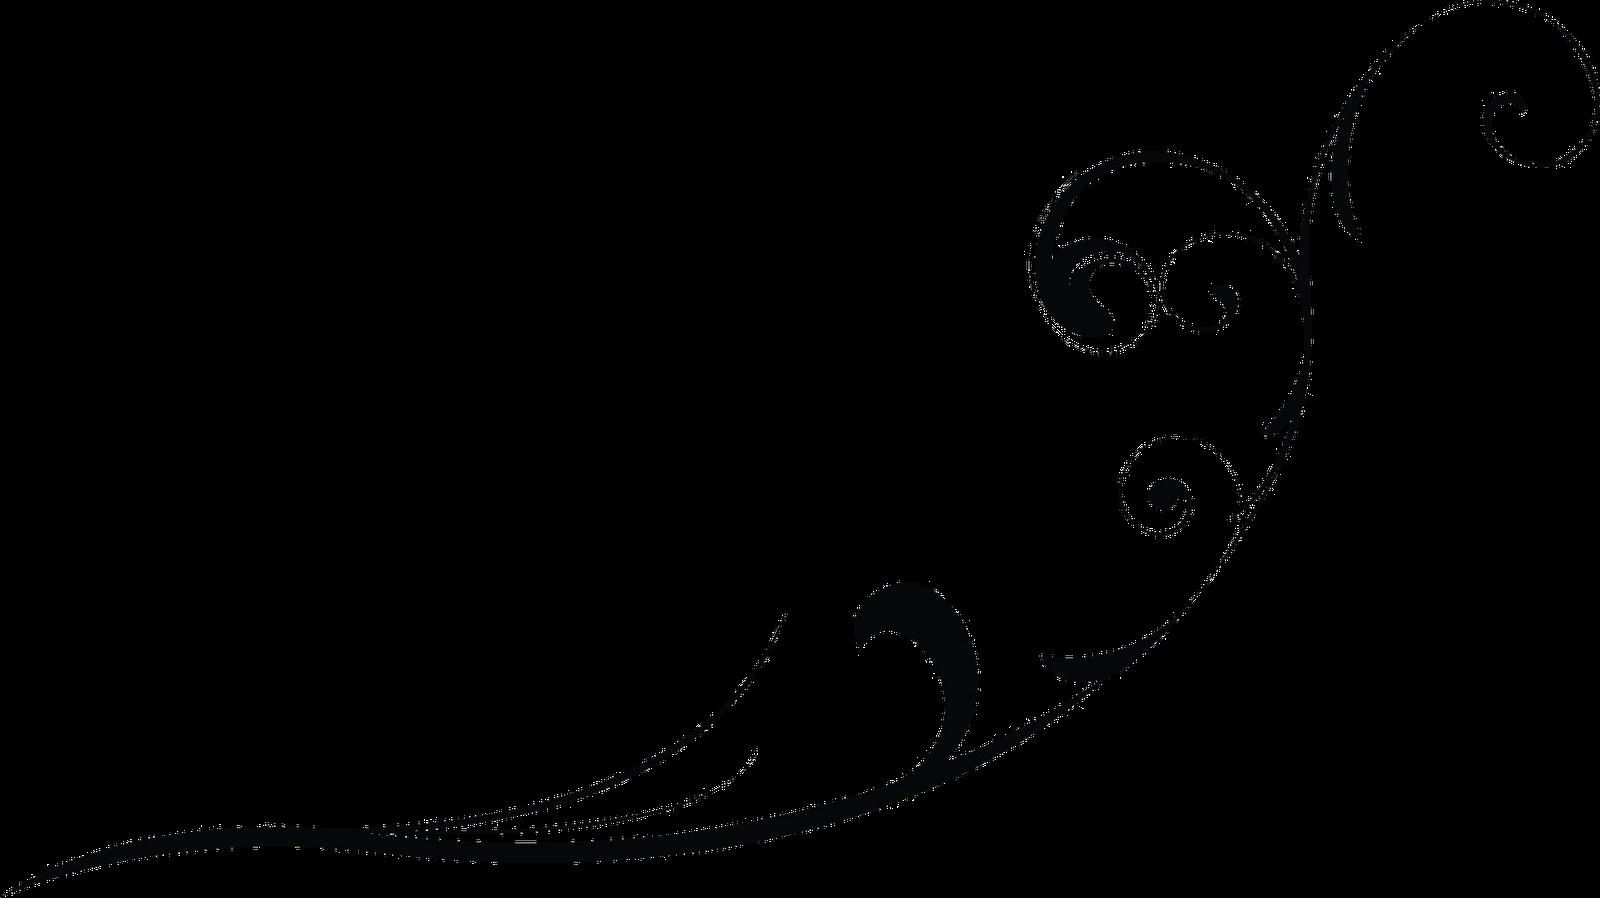 Black Swirl Designs Png #33366.